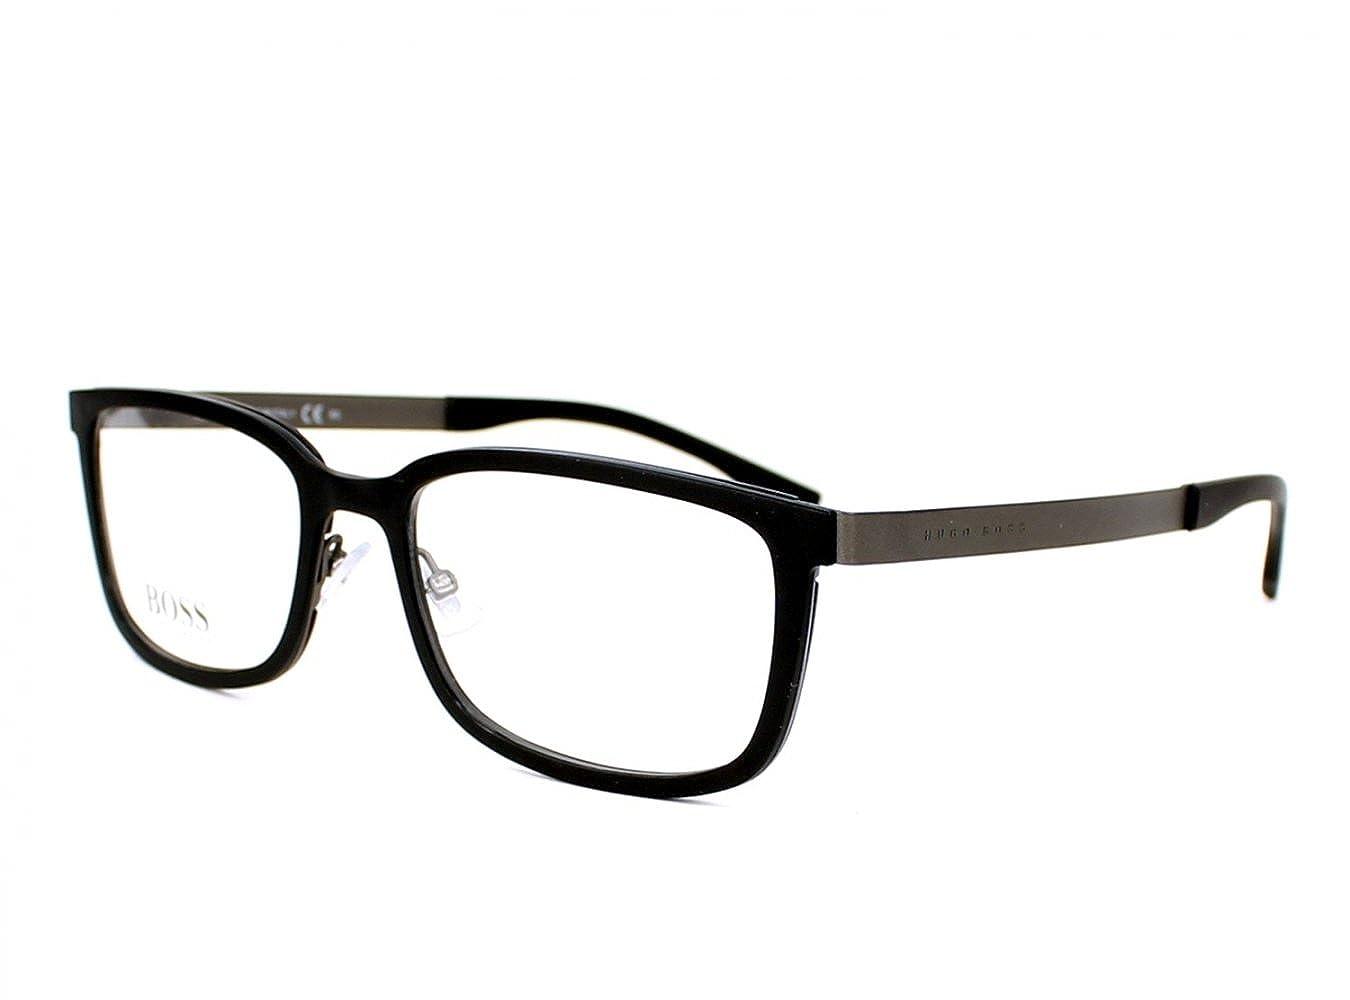 Eyeglasses Boss Black 726 0KDJ Ruthenium Boss (hub) BOSS 0726 KDJ